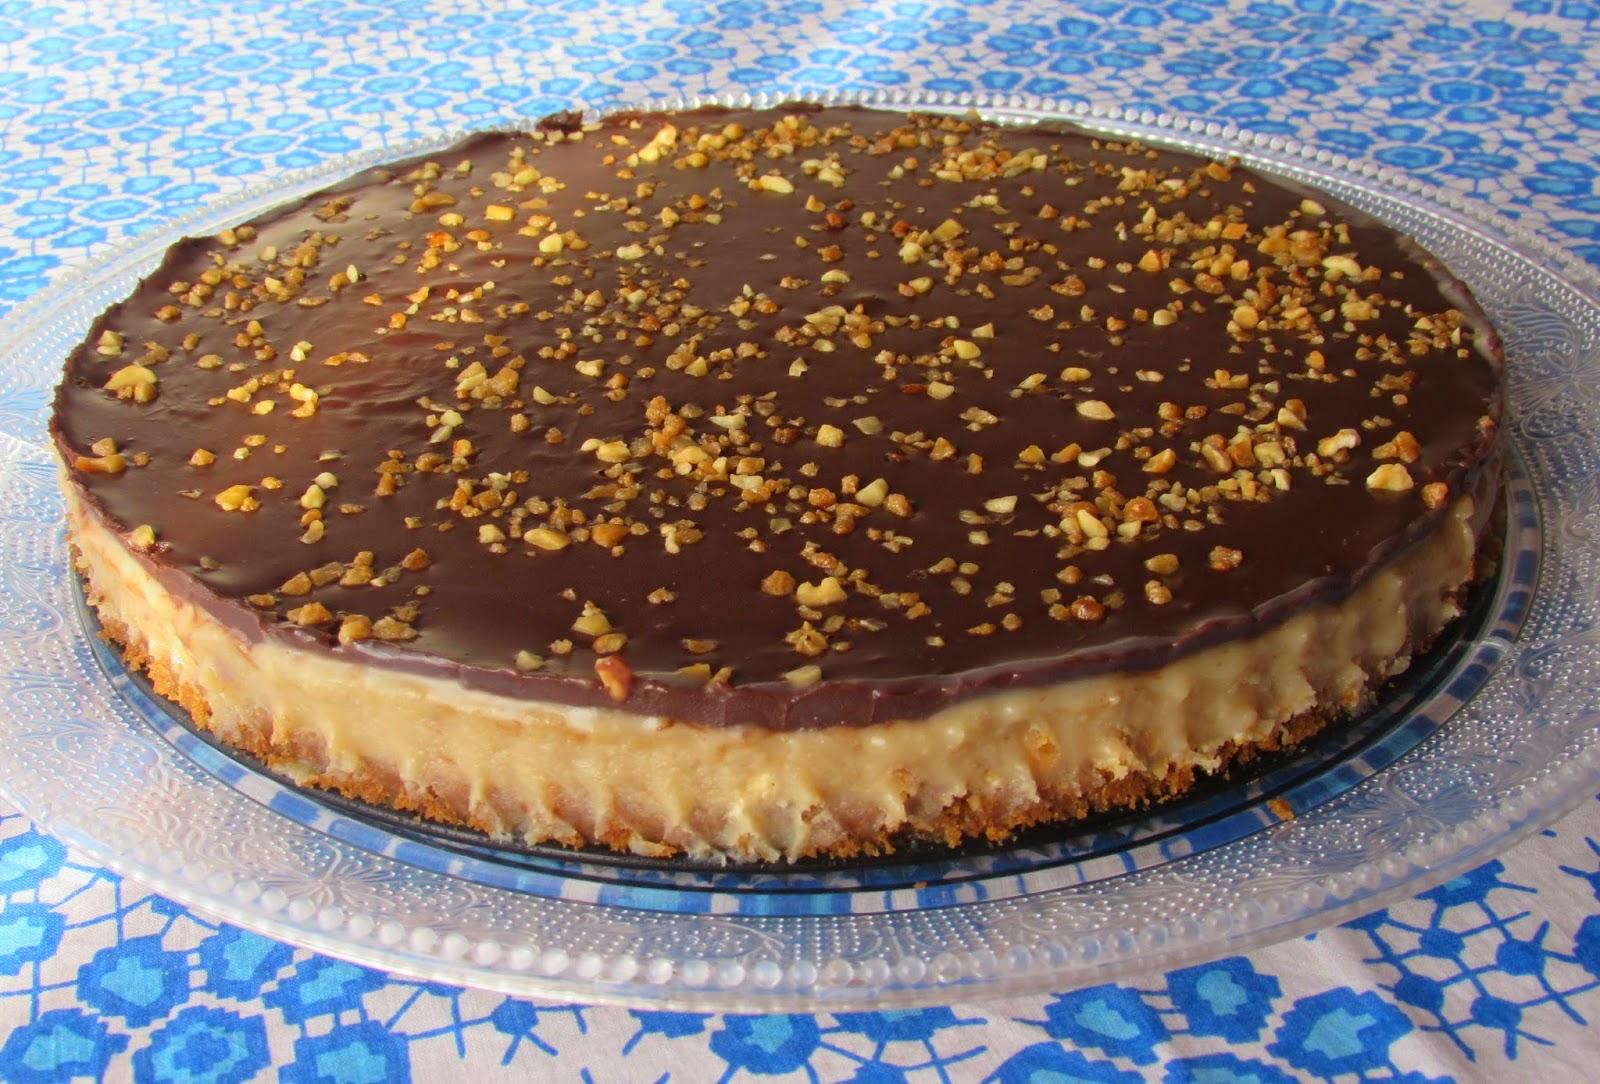 Tarta chocolatina, nocilla, nutela, receta